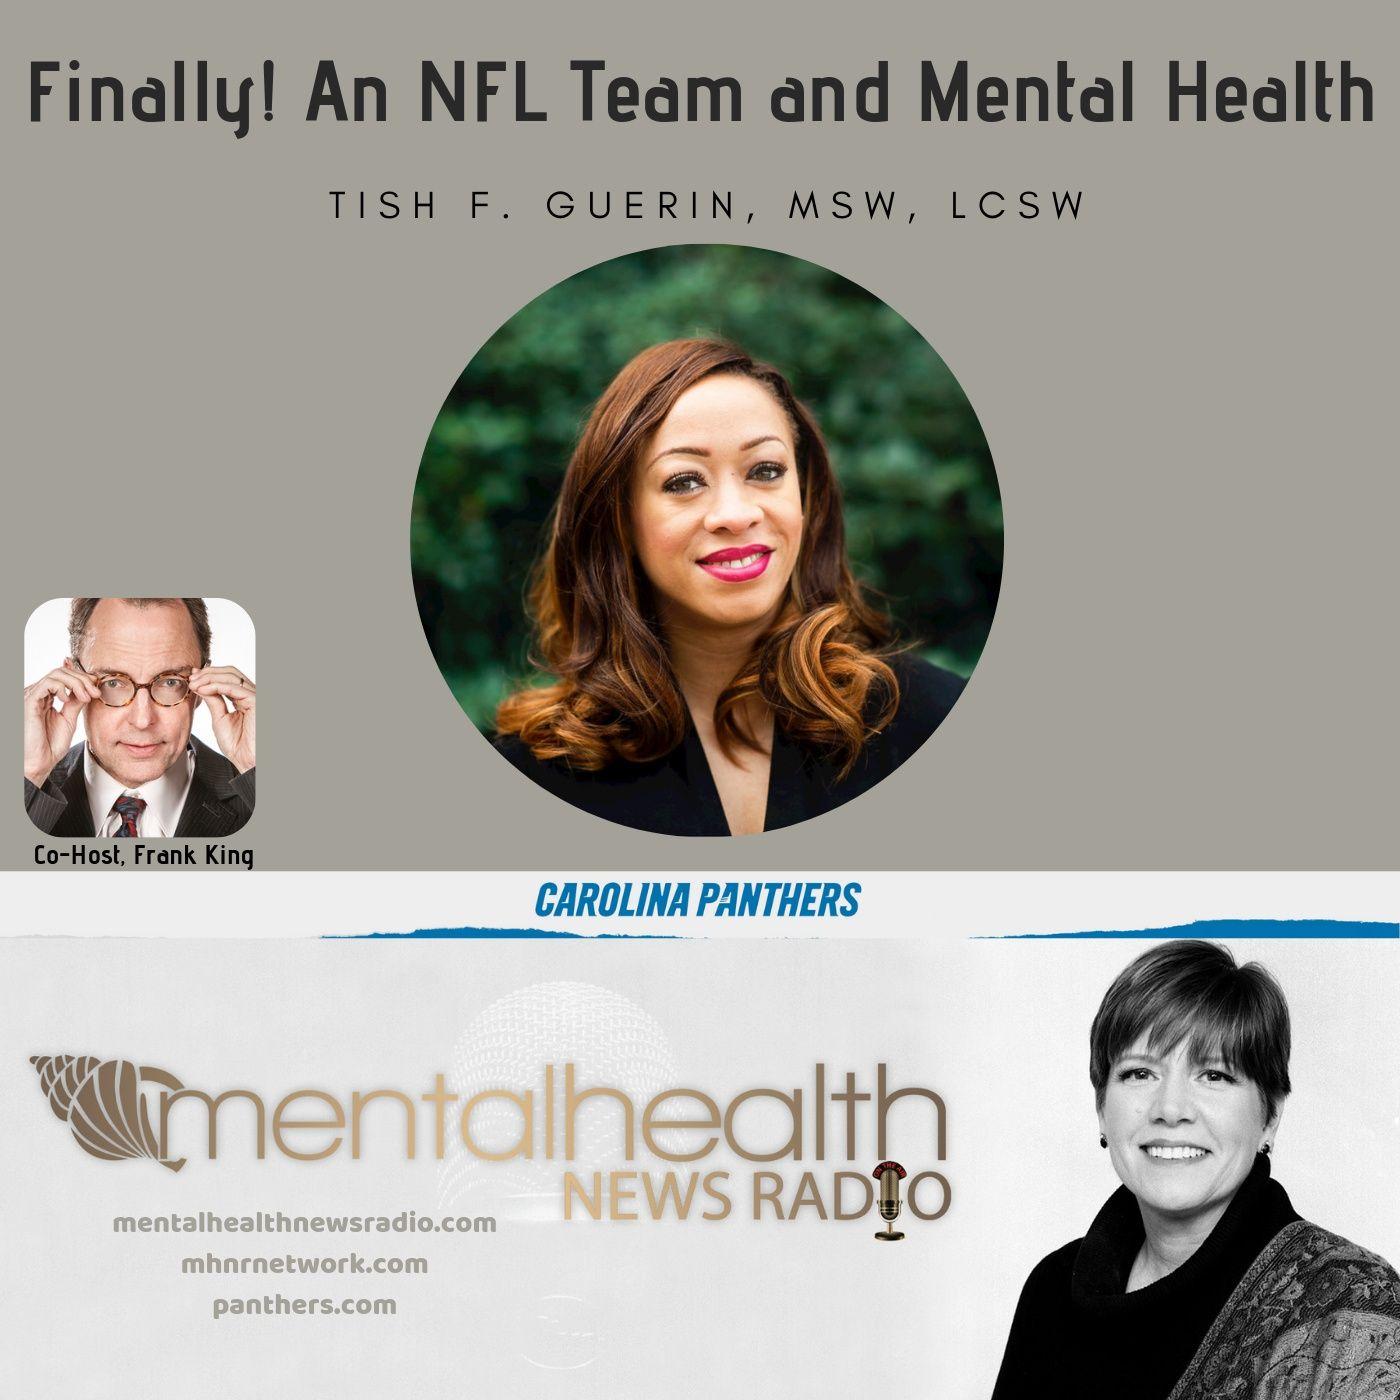 Mental Health News Radio - Finally! An NFL Team and Mental Health: Tish Guerin